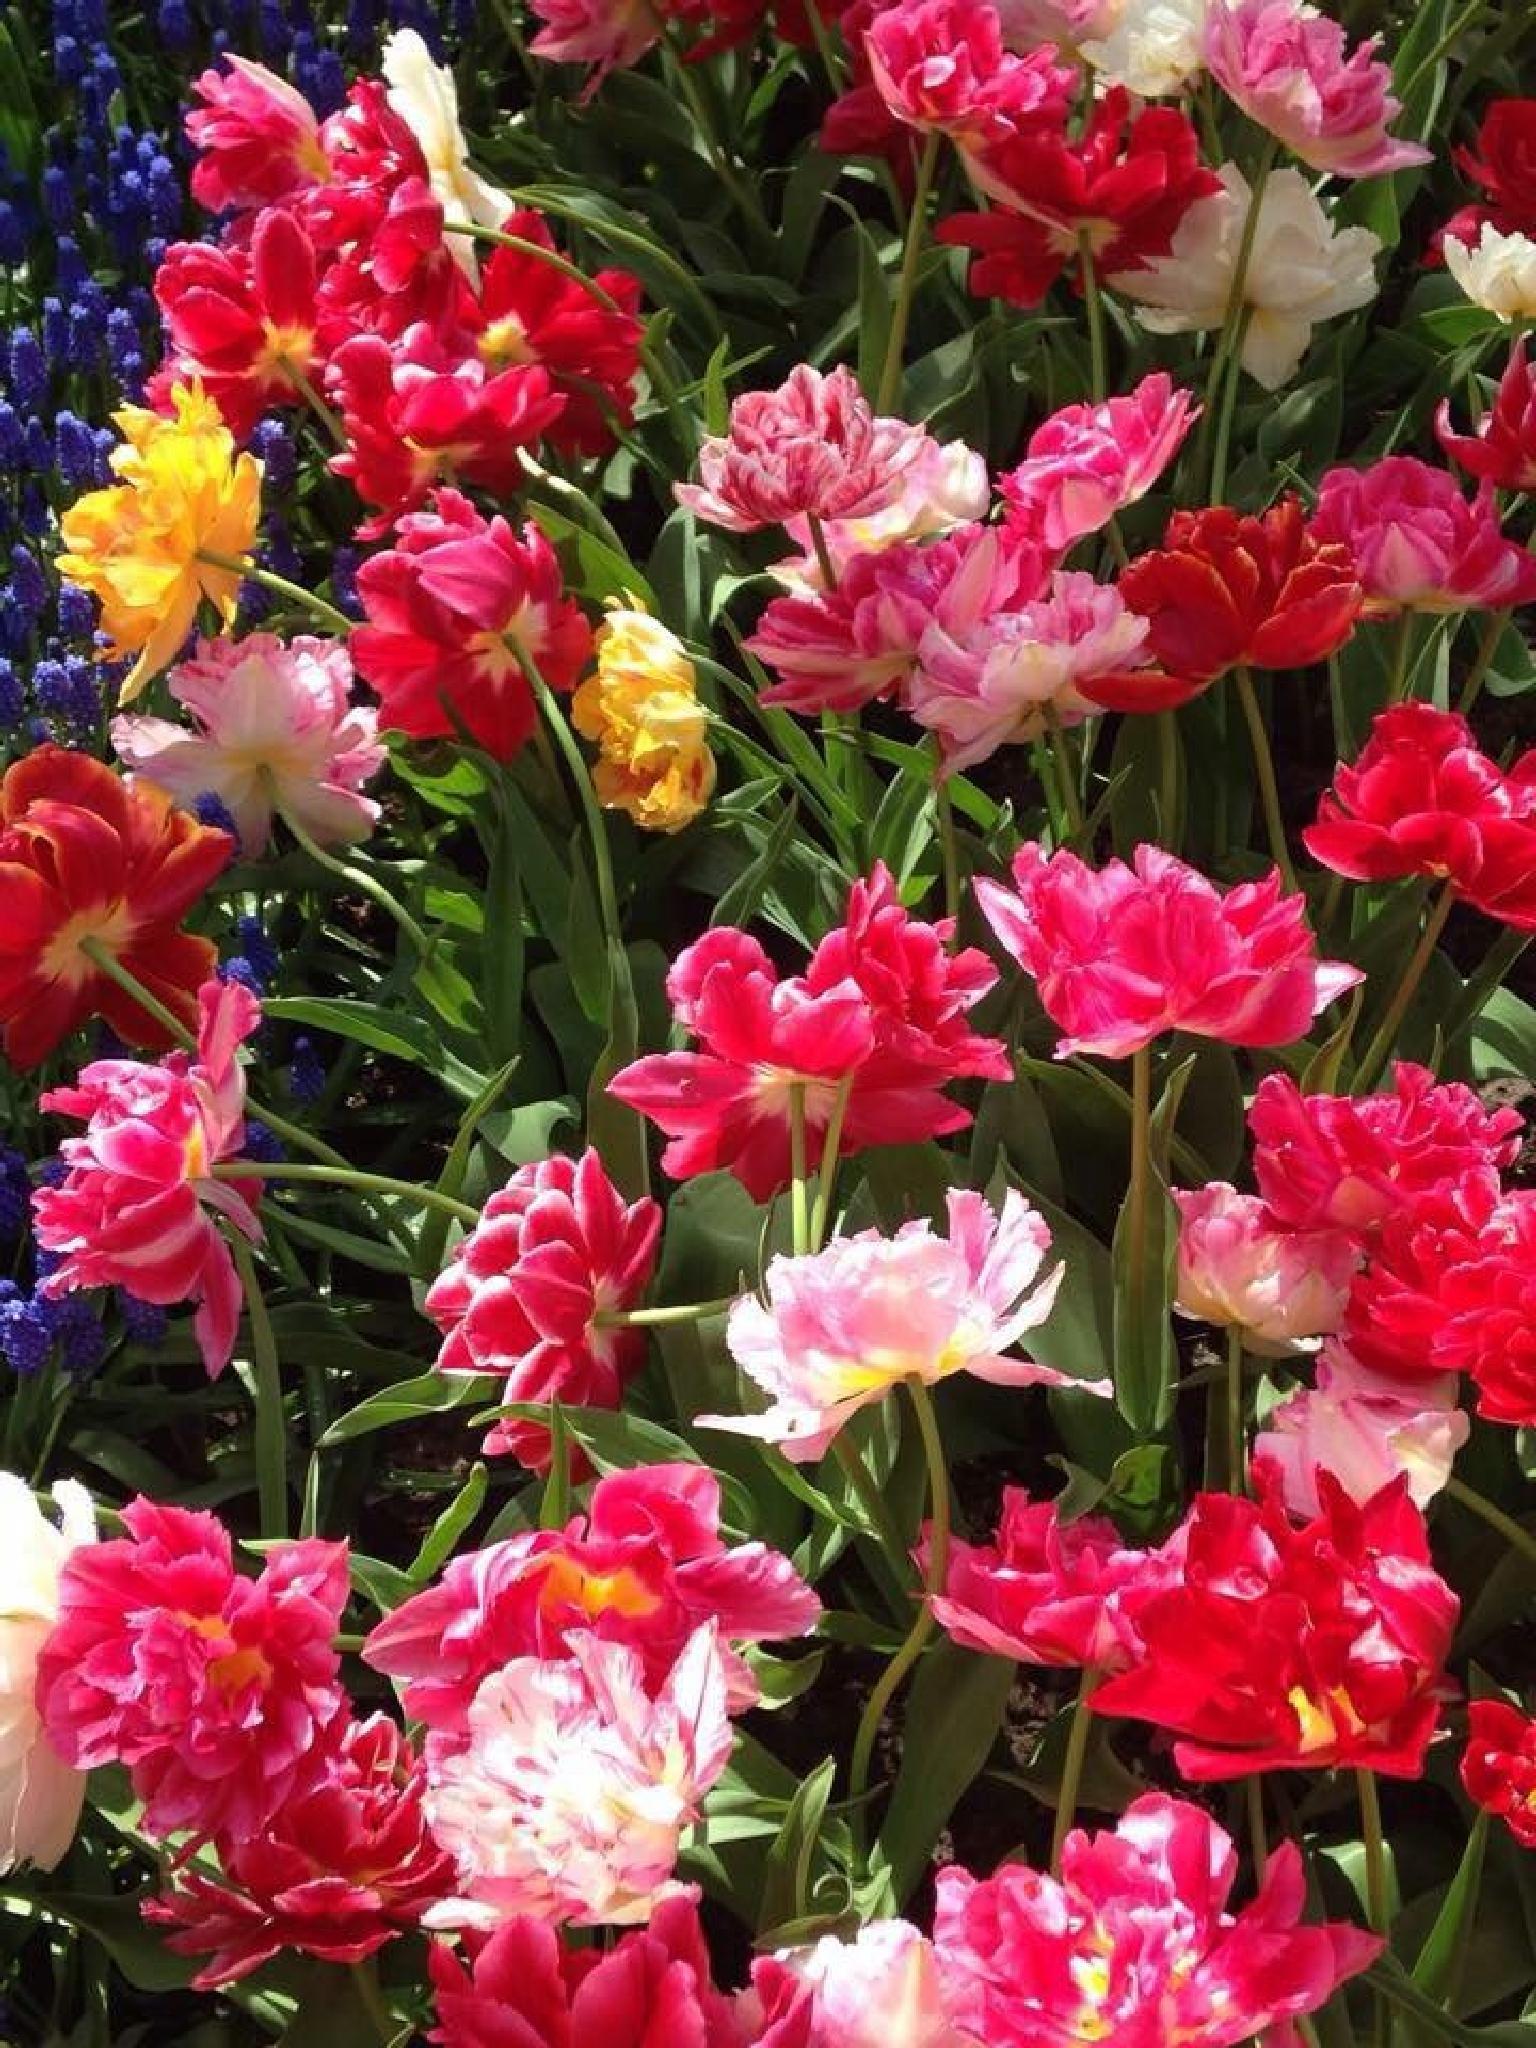 Tulips by Anjana Chakraborti